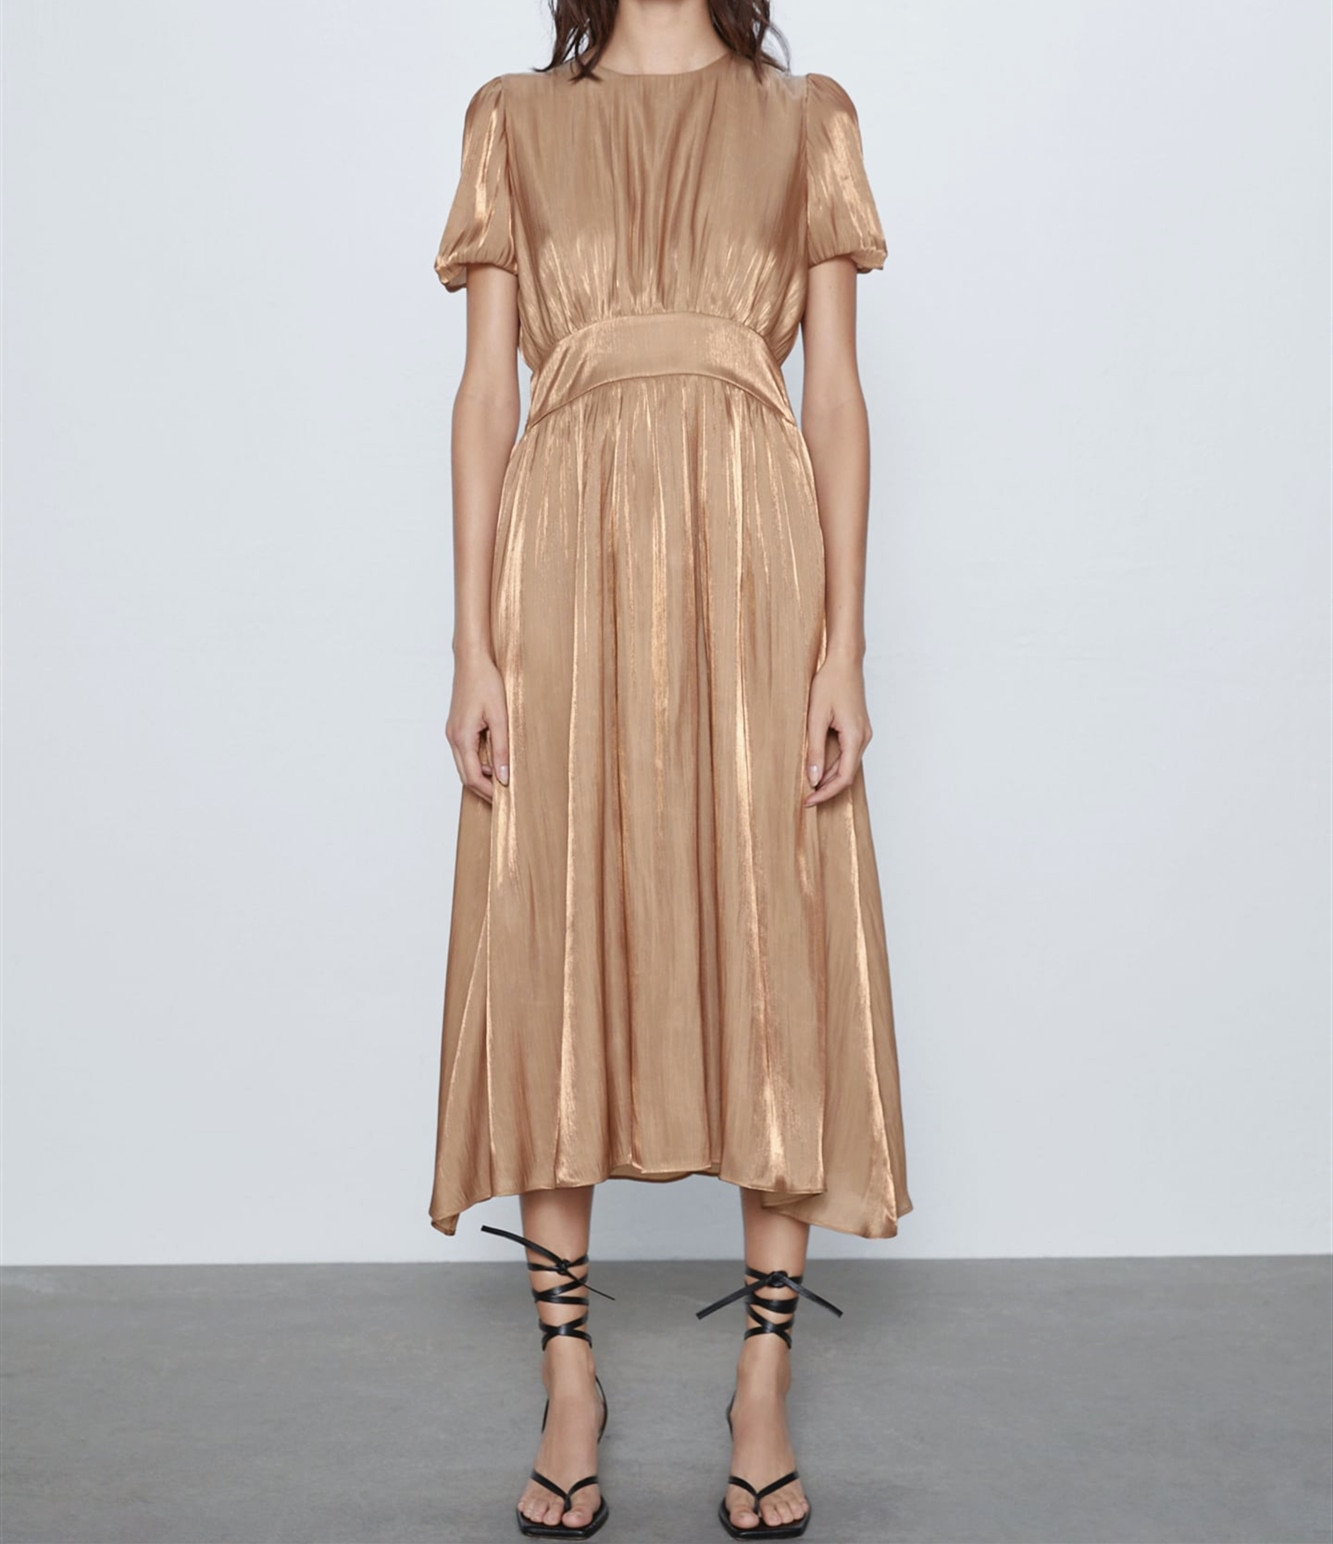 ZA elegante vestido Midi de verano para mujer 2020 Puff manga corta cremallera oculta en la espalda forro Interior femenino Formal Vestidos largos